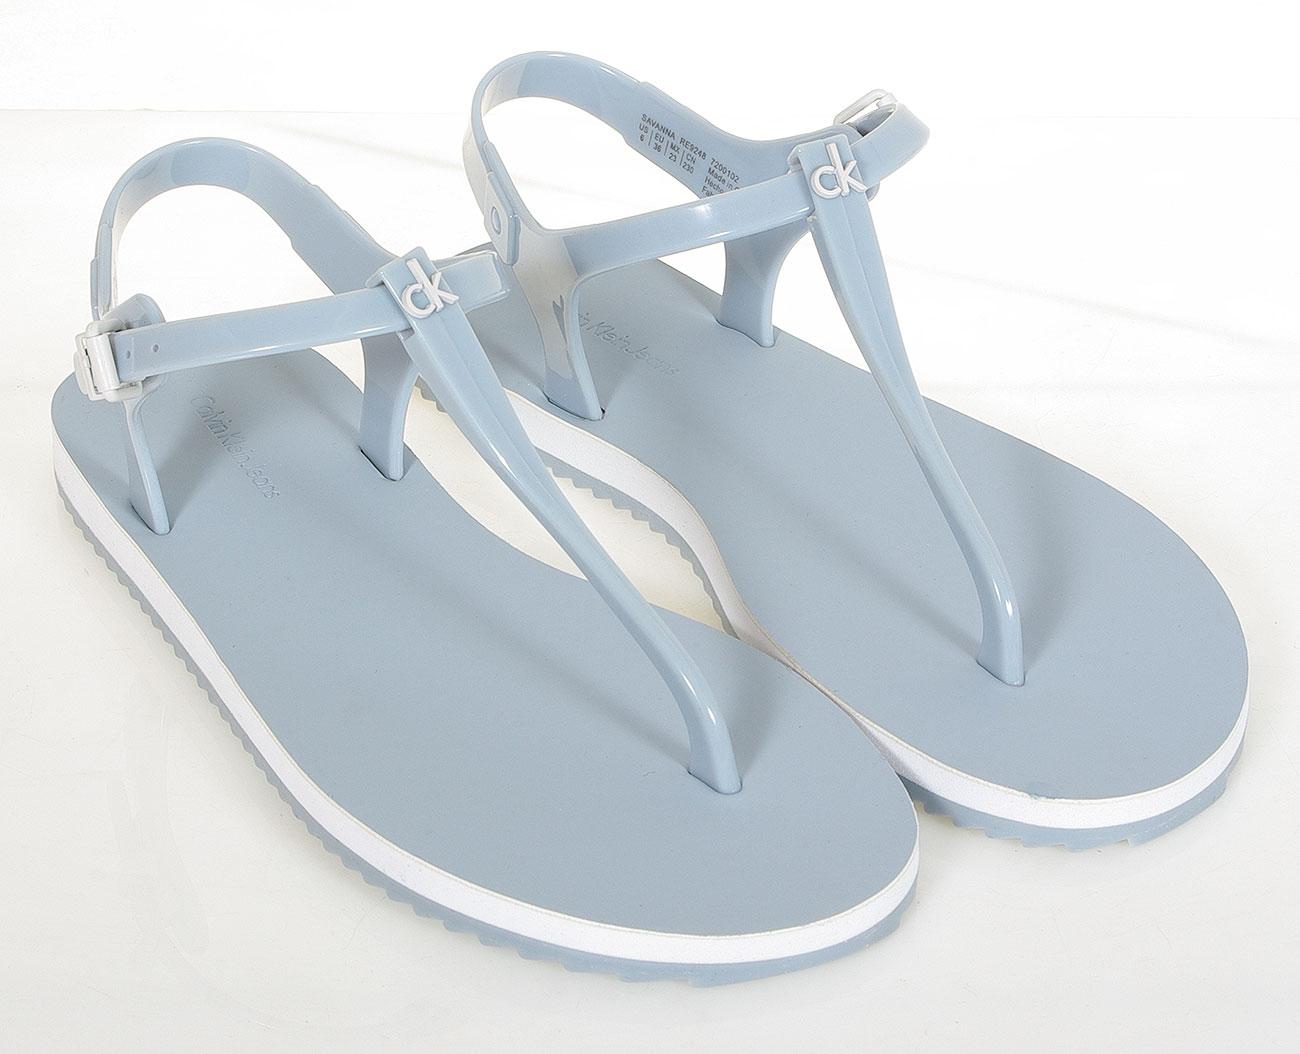 6205df7d05747 Calvin Klein Jeans Savanna Jelly Chambray japonki · Powiększenie. Previous;  Next